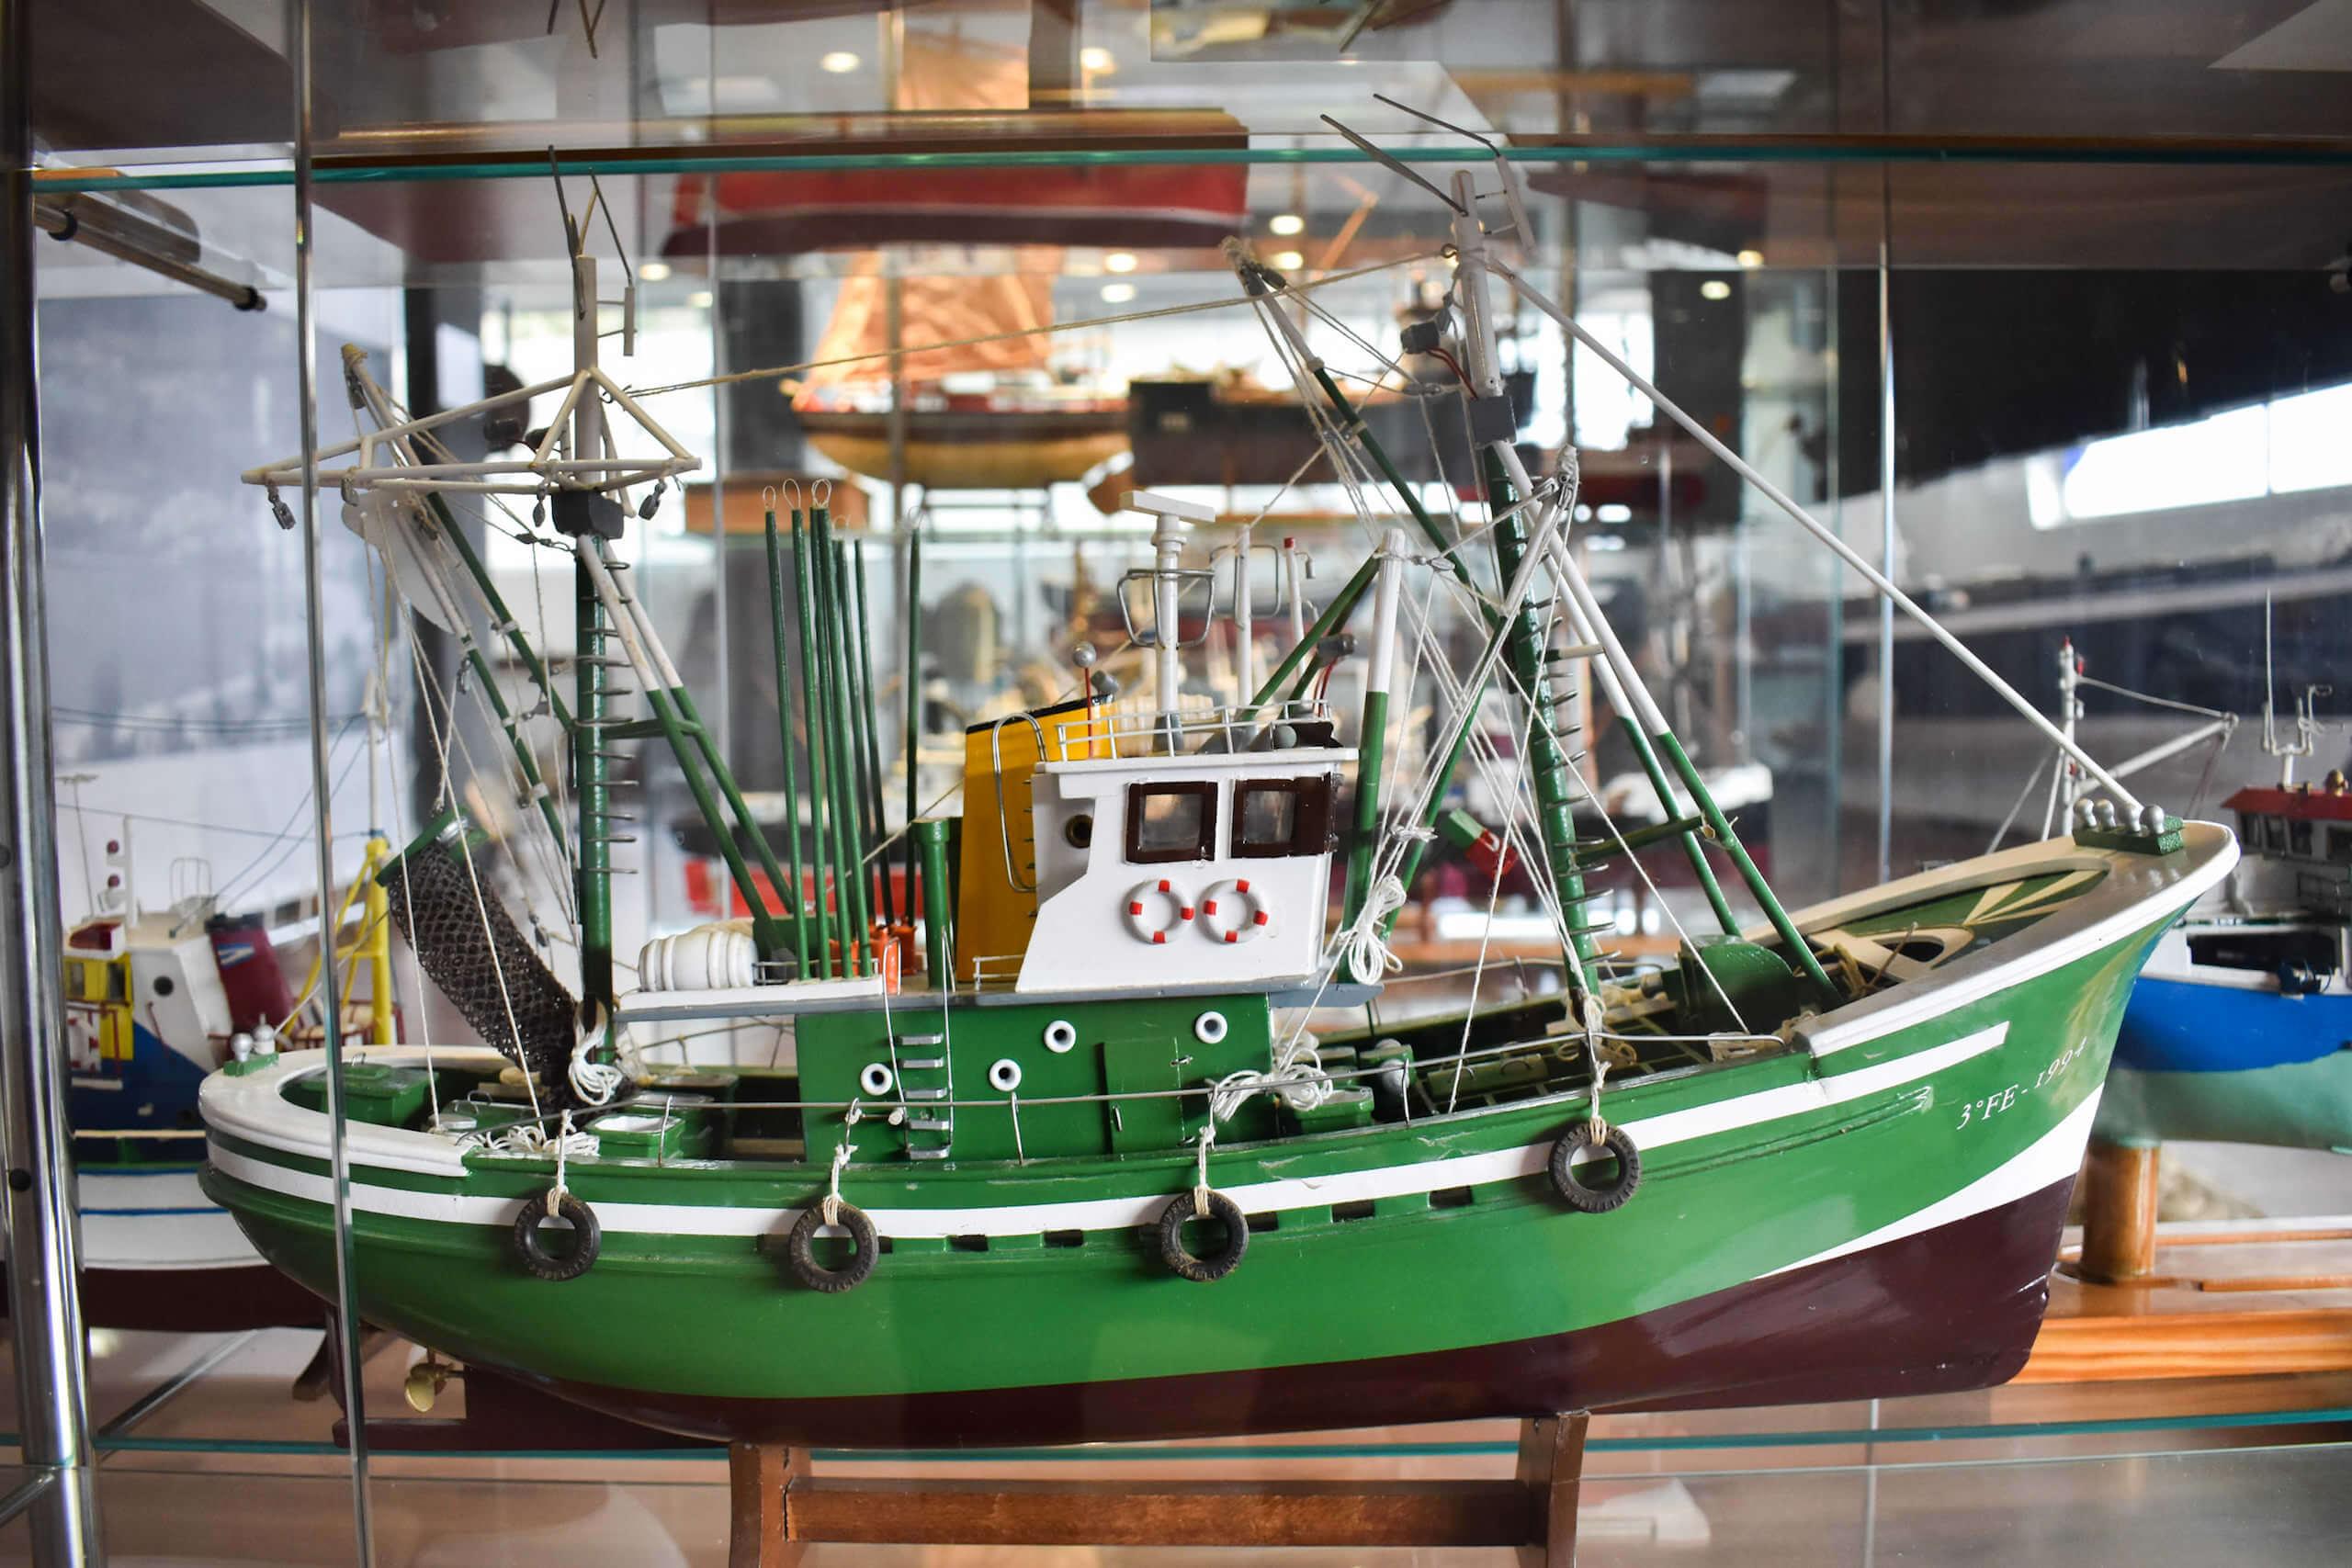 Maqueta de barco Cedeires que usaba las artes de pesca - aparejos de pesca